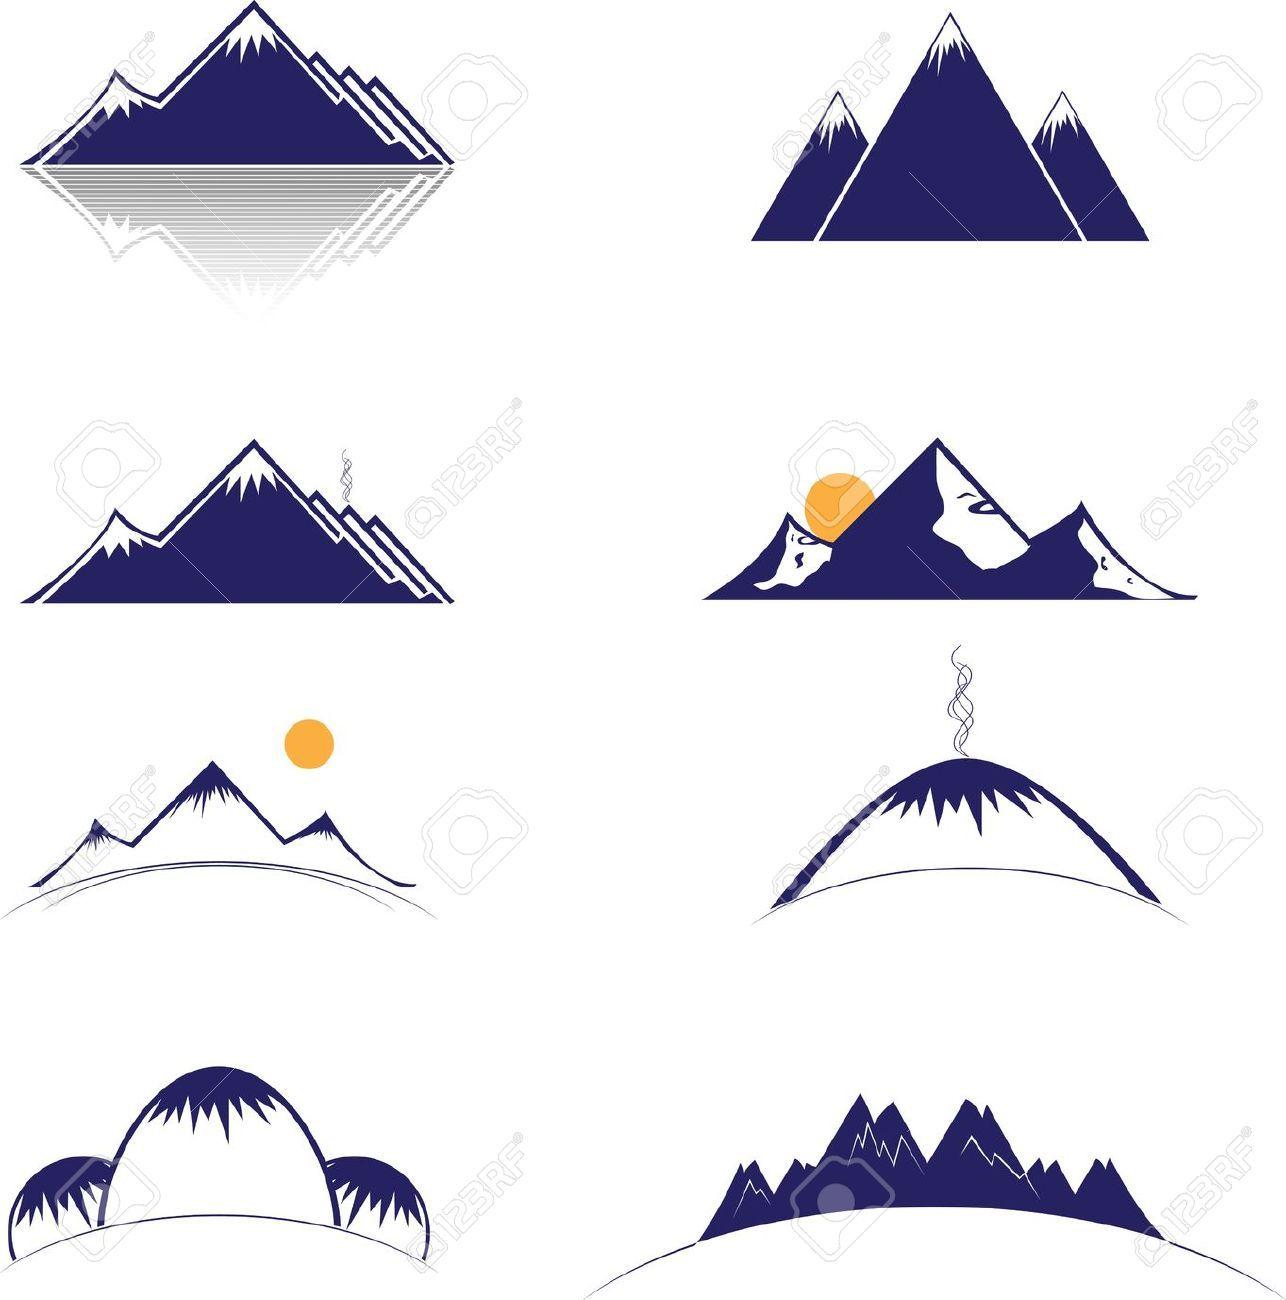 mountainscape vector Google Search Mountain drawing